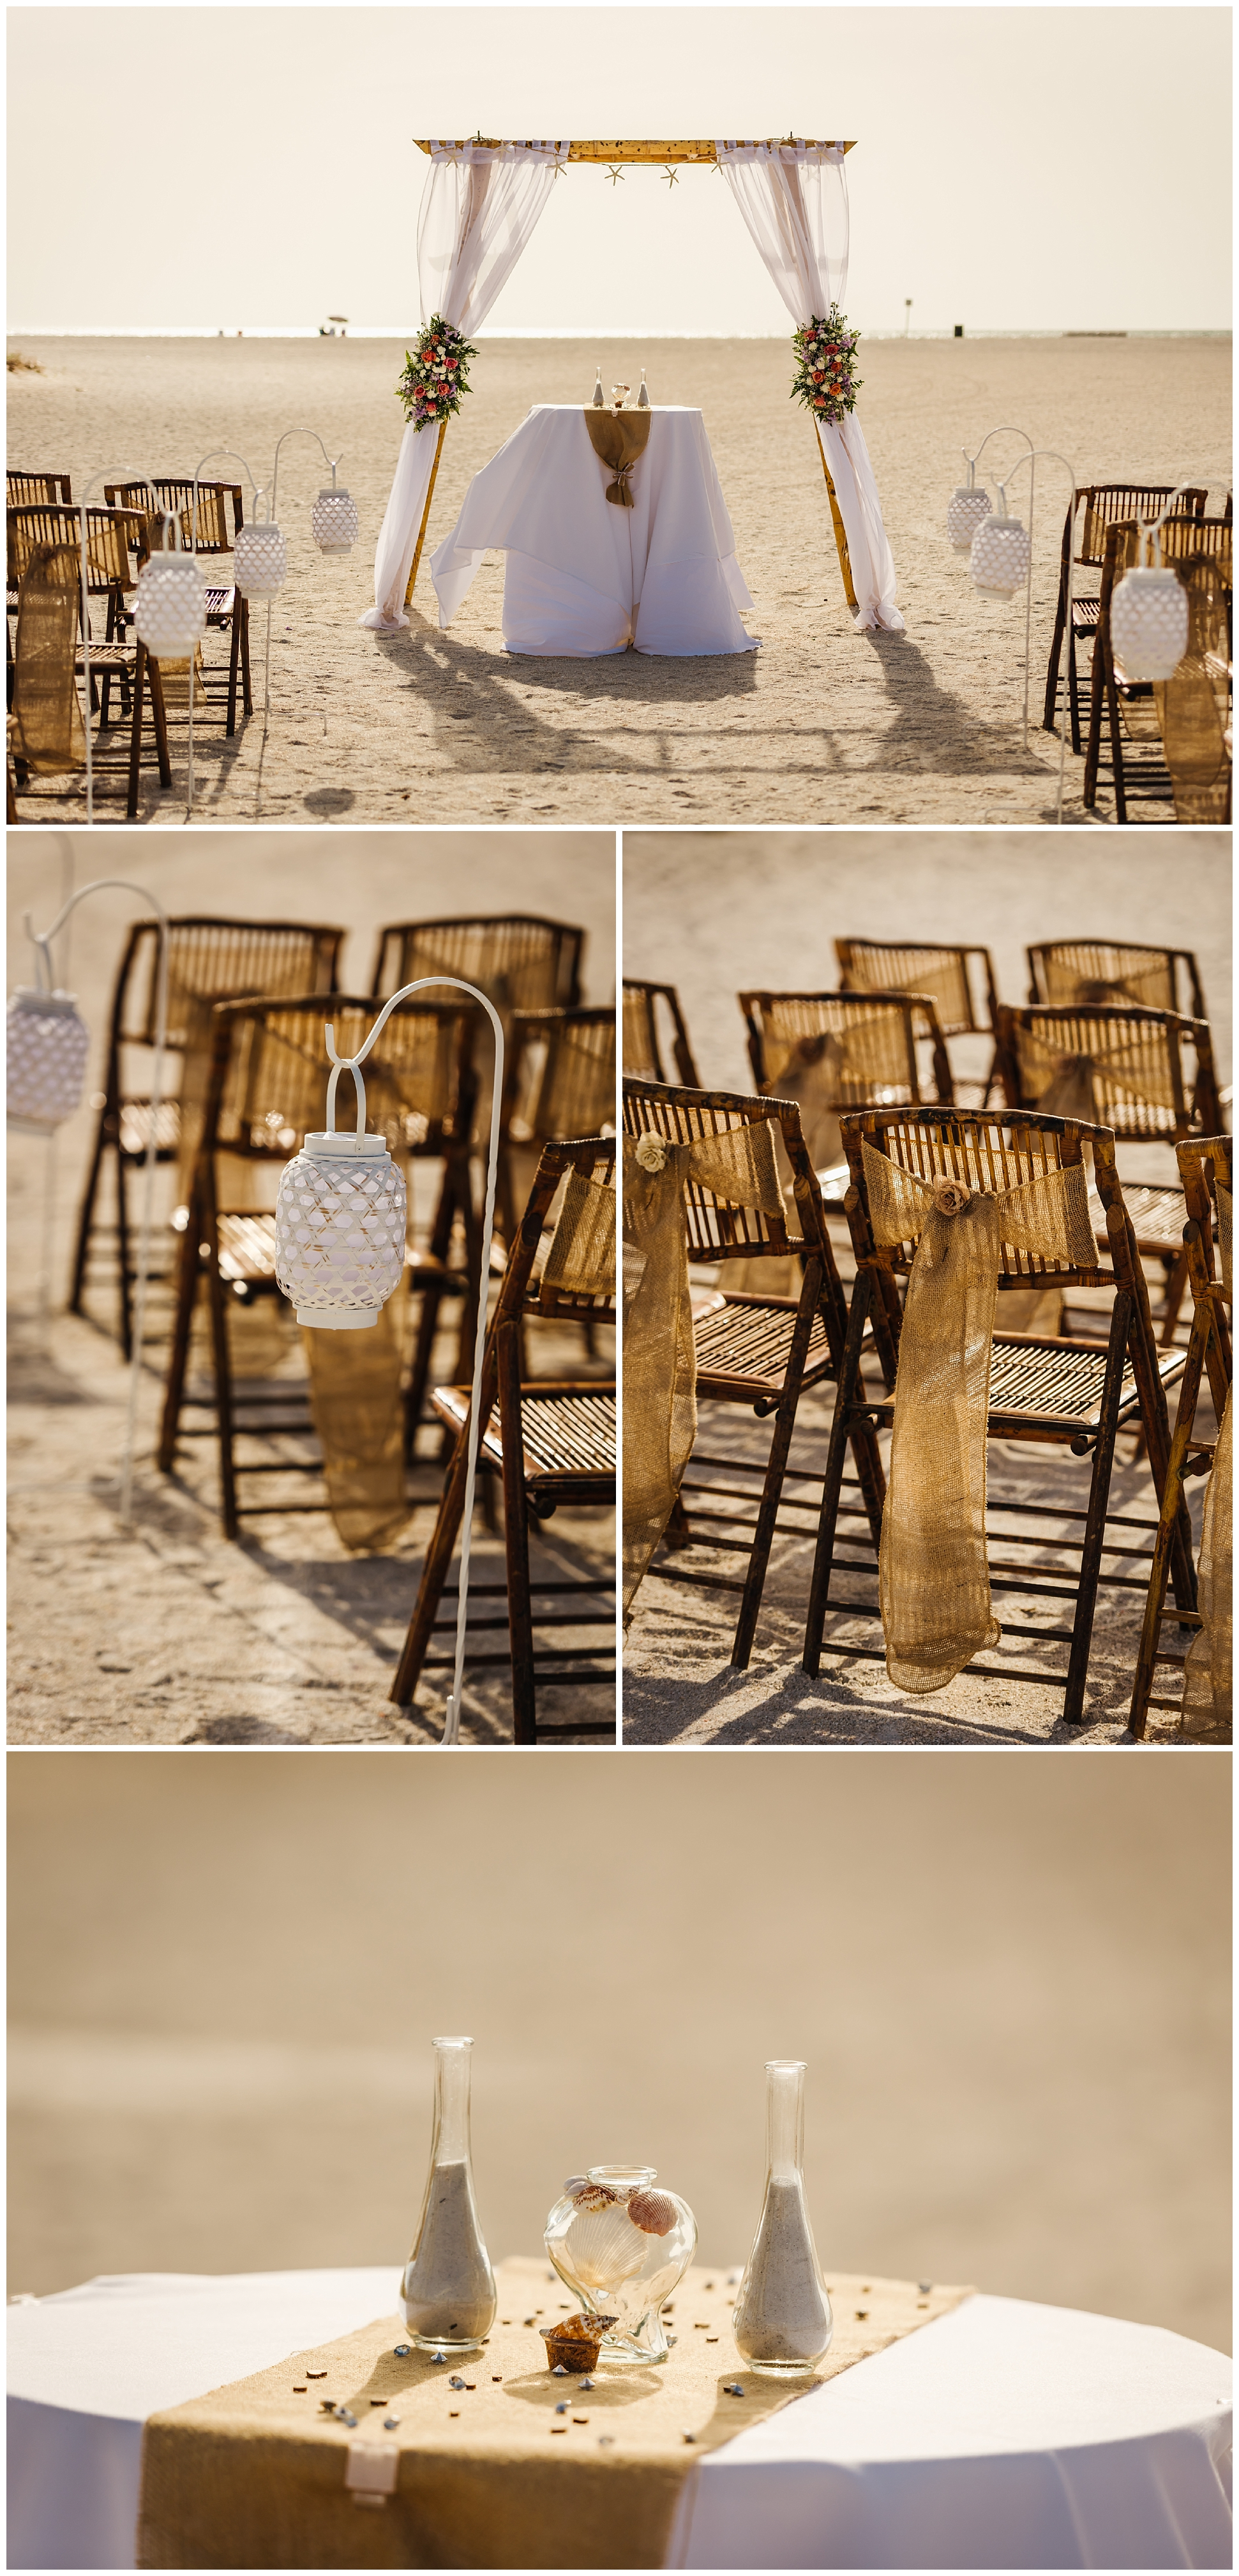 Clearwater-destination-wedding-photographer-jimmy-choo-yves-st-laurent-sunset_0078.jpg